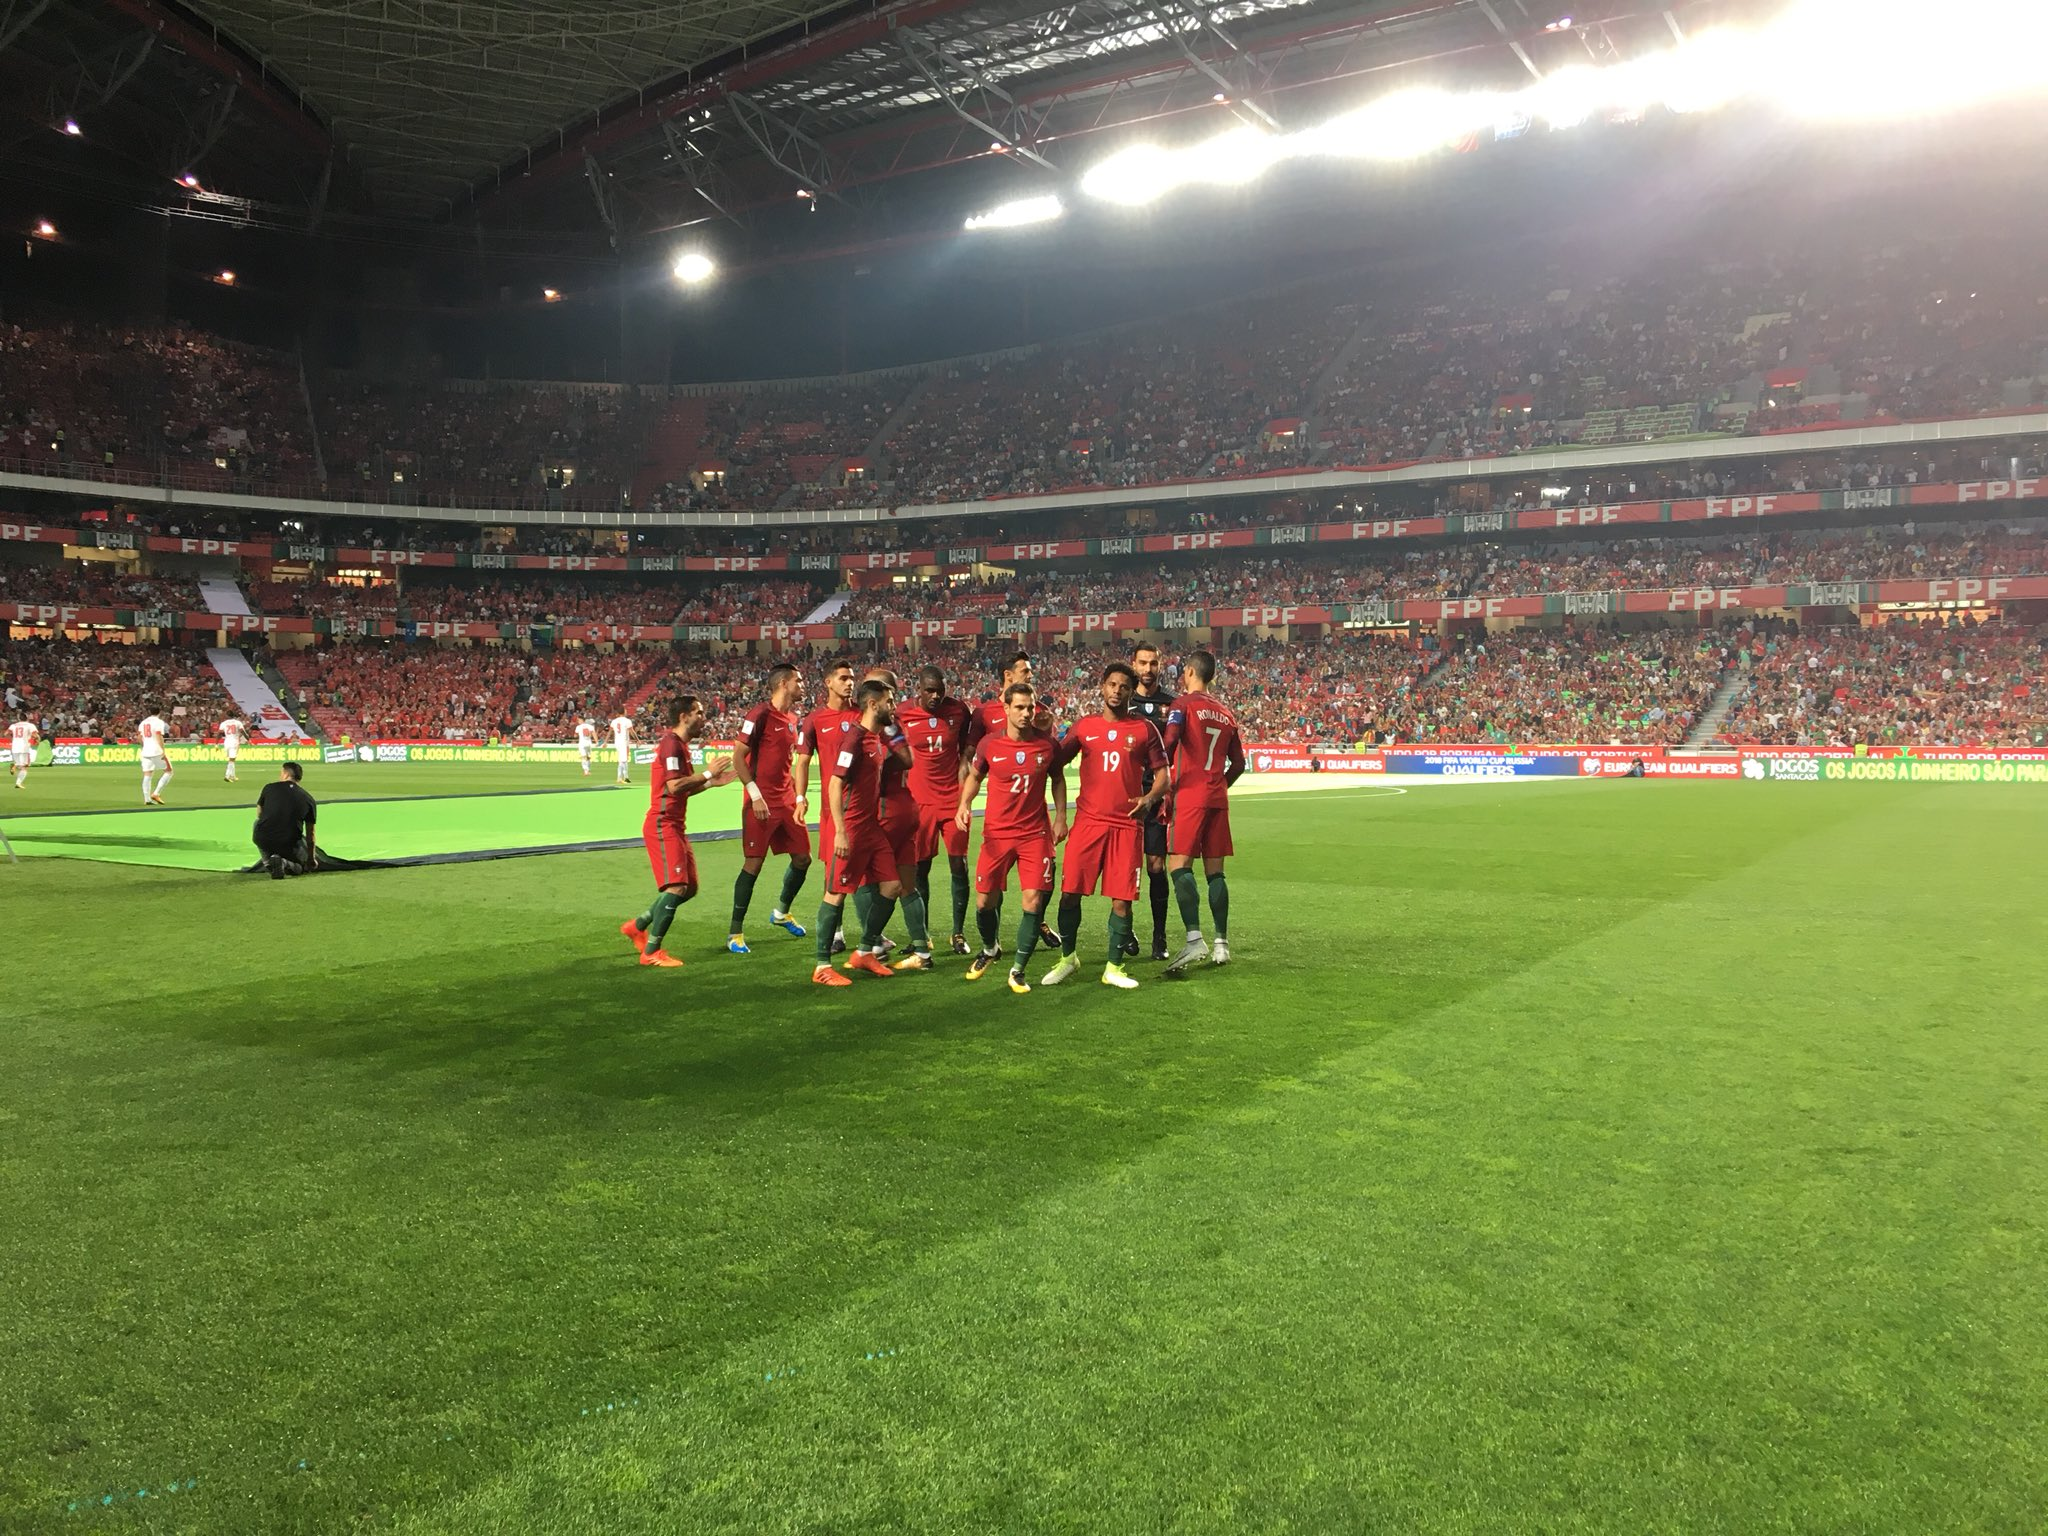 Франция иПортугалия вышли начемпионат мира-2018 пофутболу